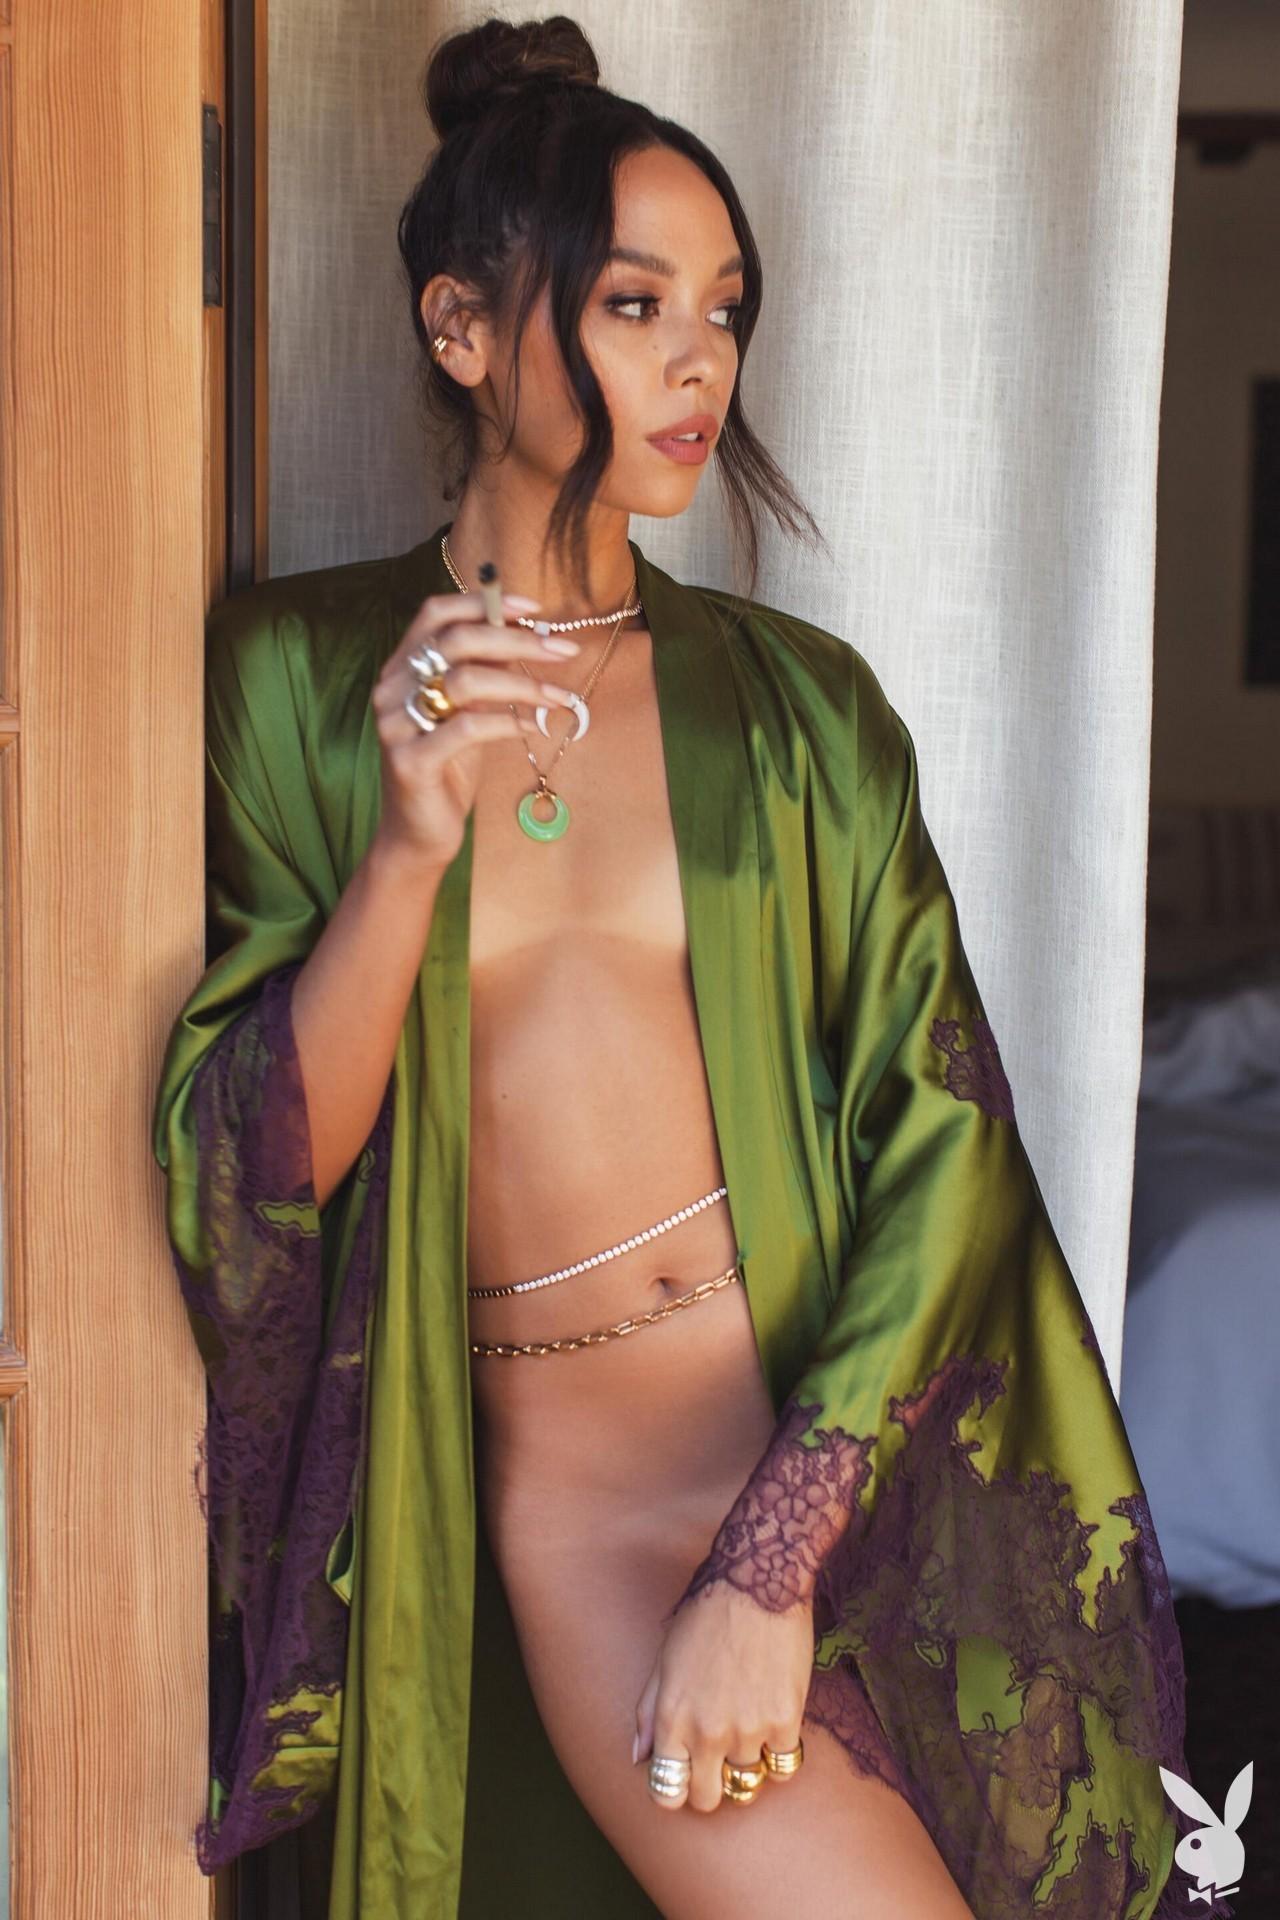 Danielle Alcaraz Playmate Outtakes Playboy Plus (10)